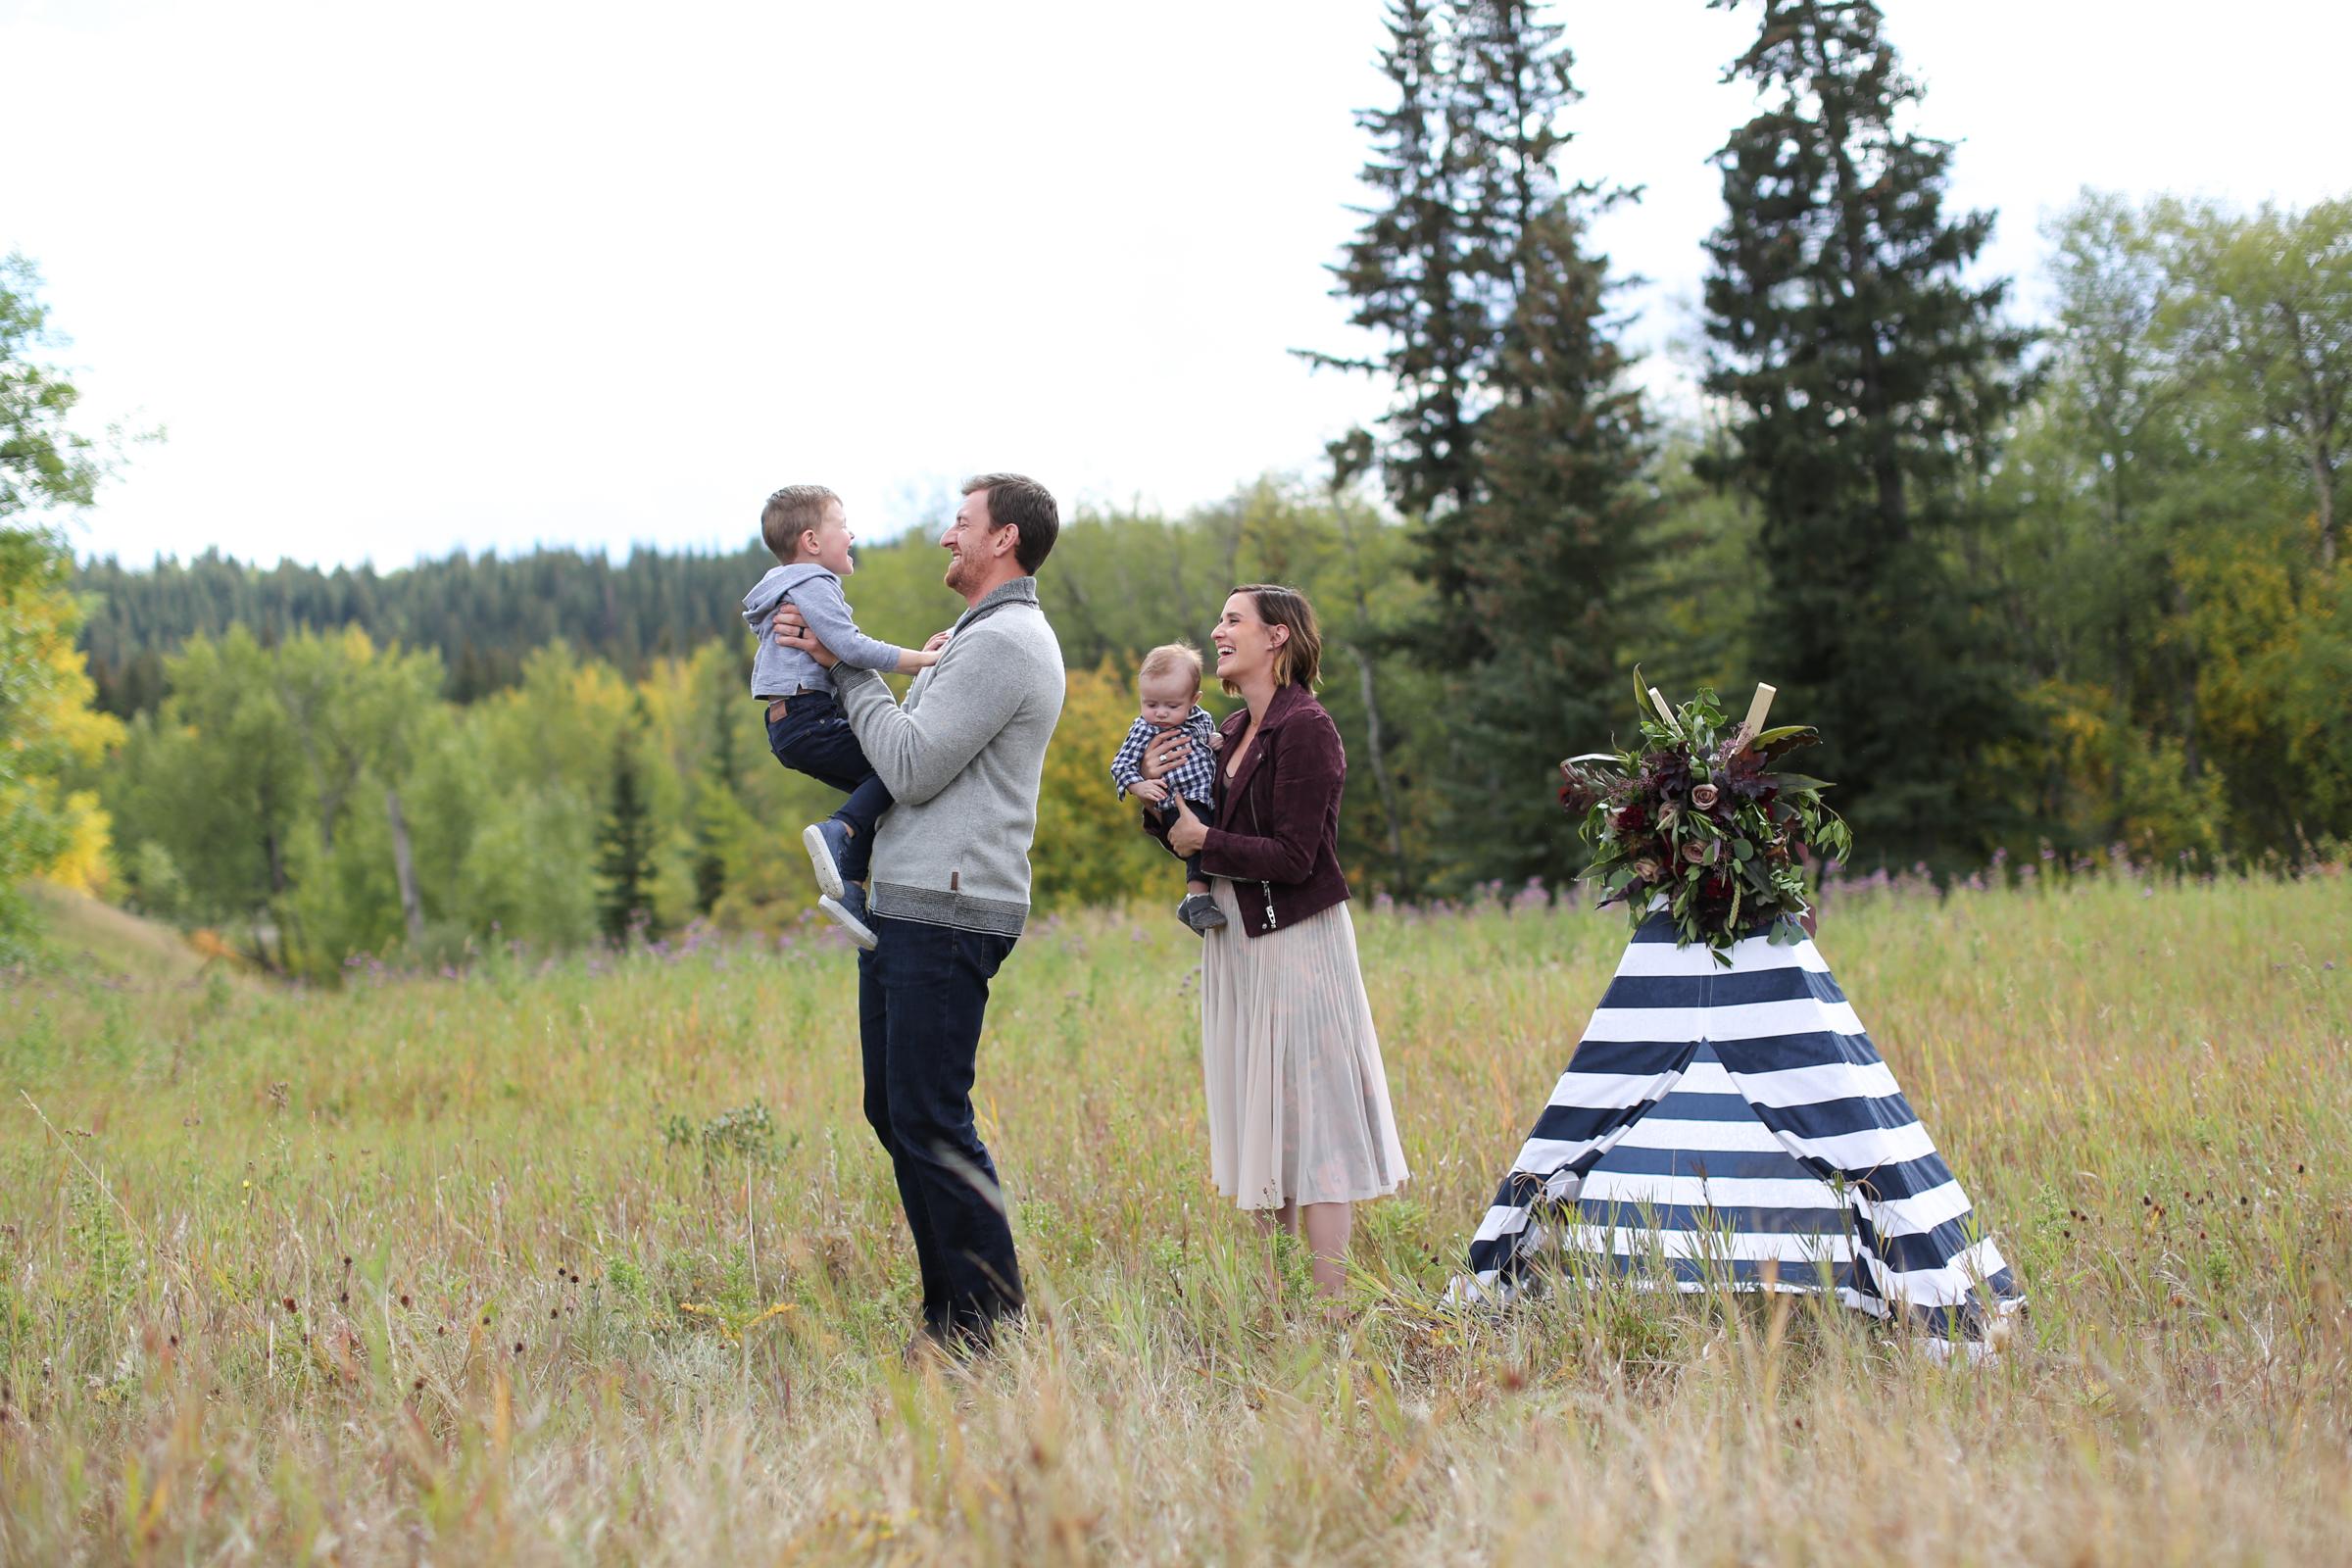 Fall-Family-Creative-Lindsay_Skeans_Photography-14.jpg